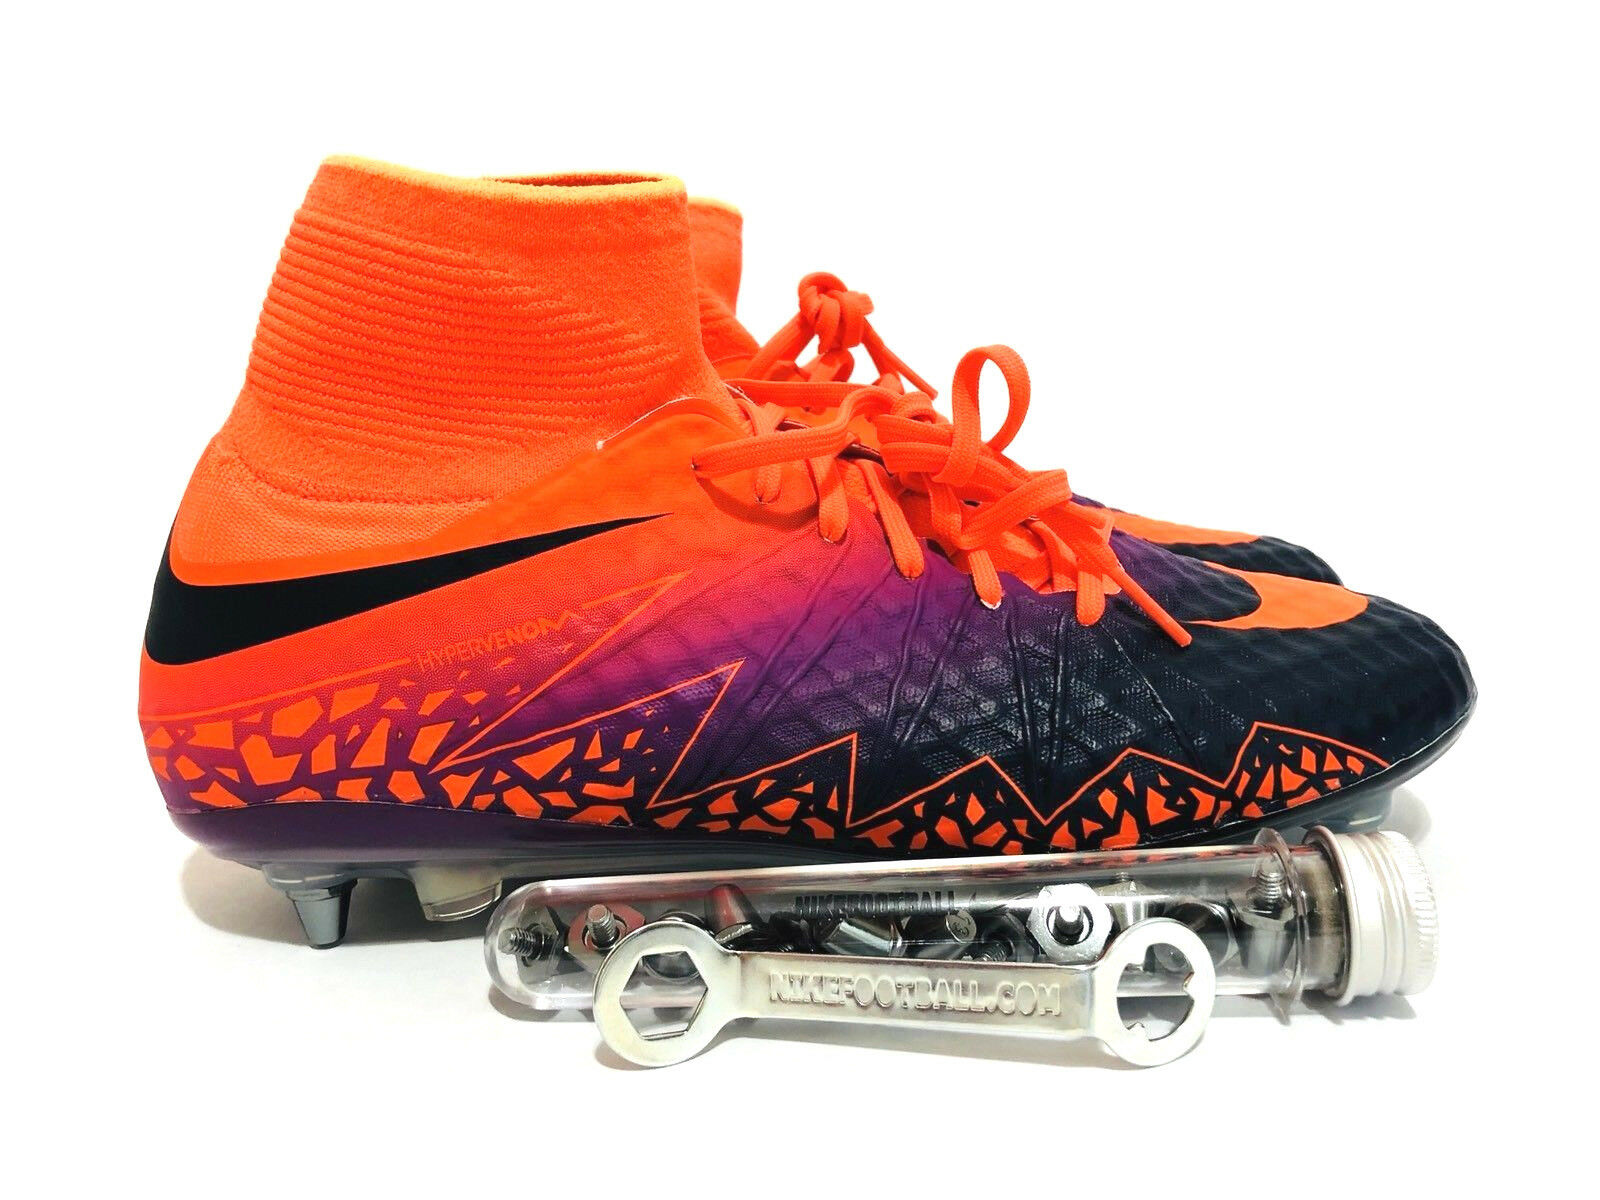 NIKE HYPERVENOM PHANTOM II SG PRO Orange Purple FOOTBALL CLEATS SIZE 10 NEW